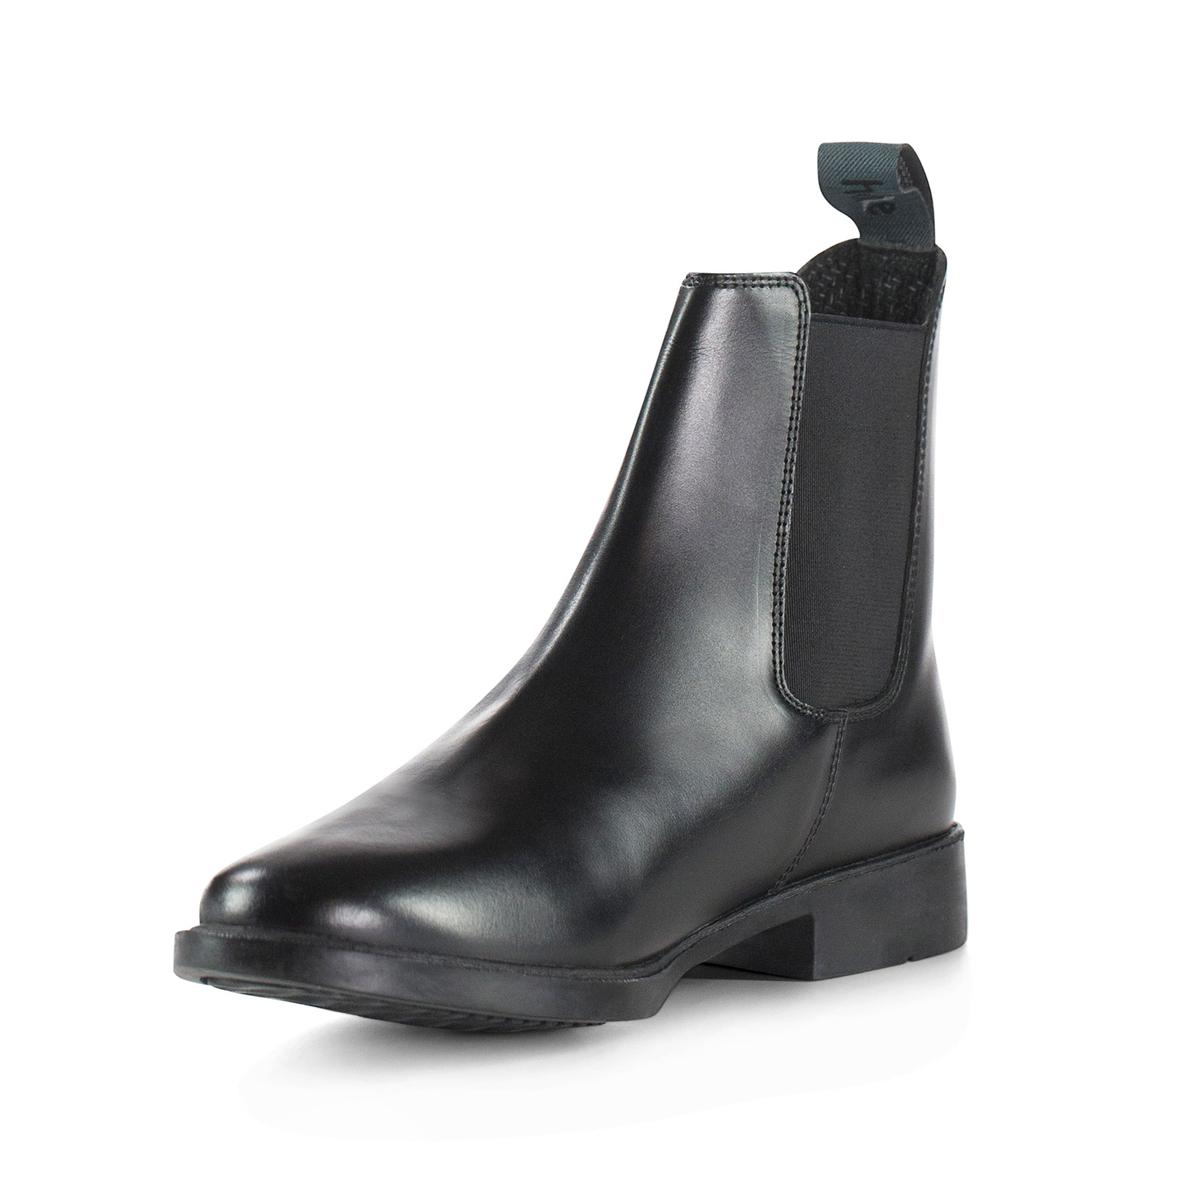 Horze Signature Paddock Boots | Horze